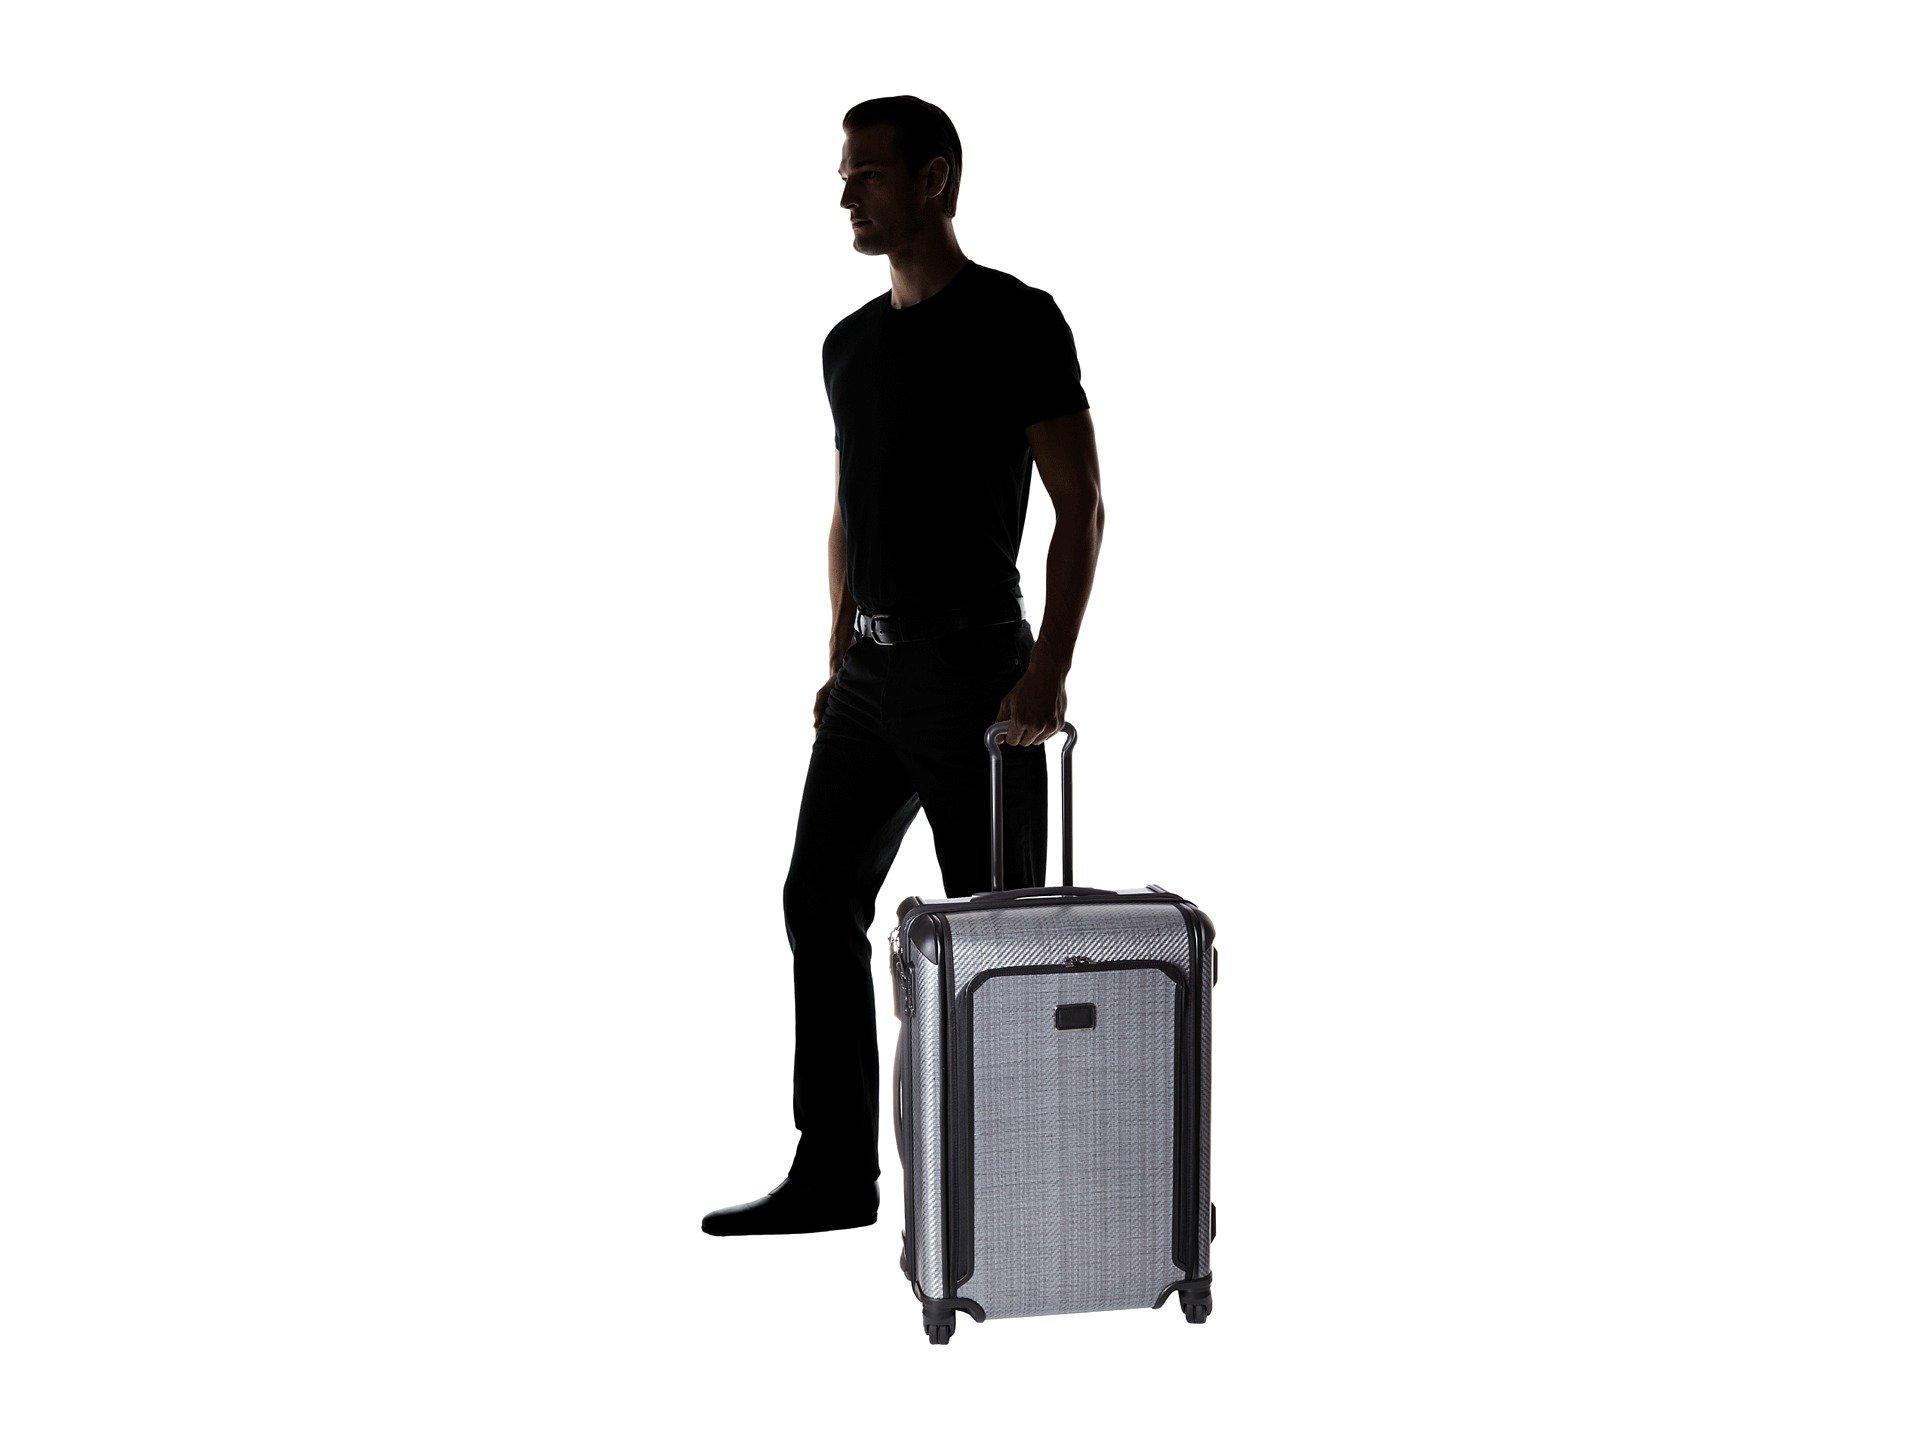 Packing Trip Max Case Medium lite® Tegra T Tumi graphite Expandable WqwYR6nB